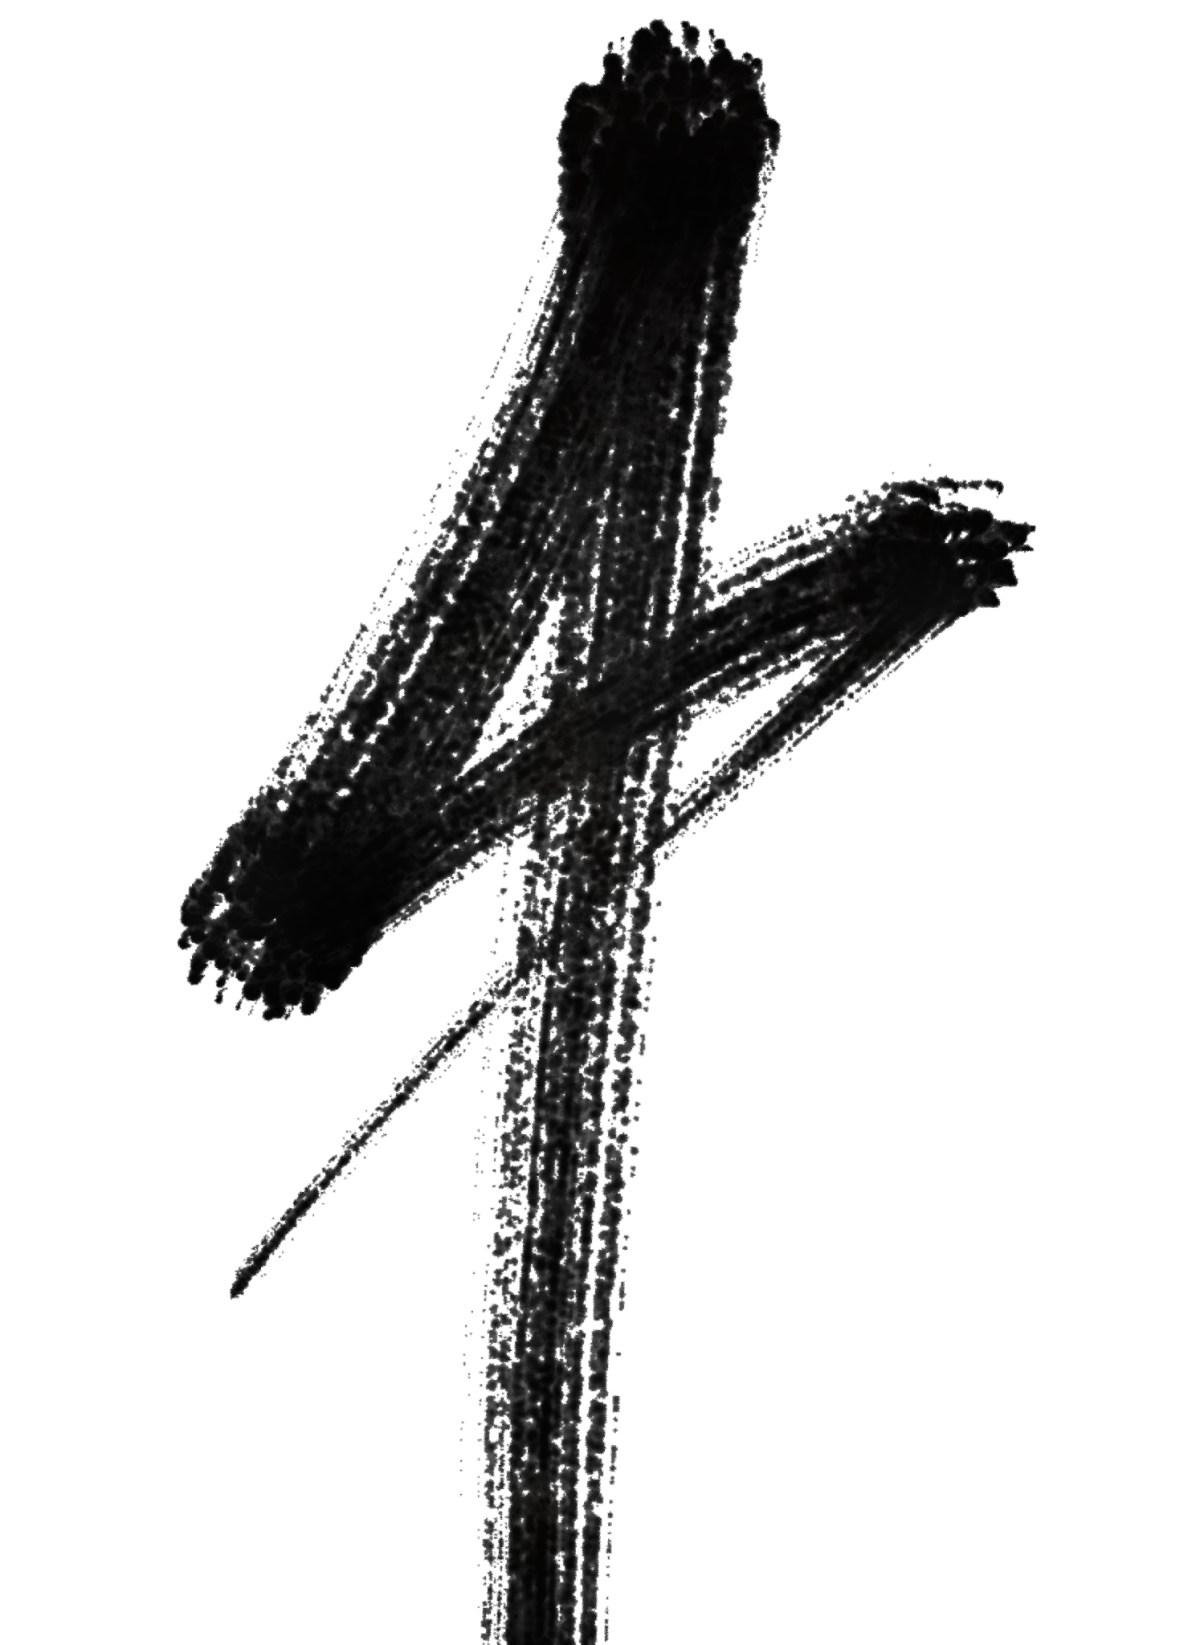 Less abstract ERIC KIM